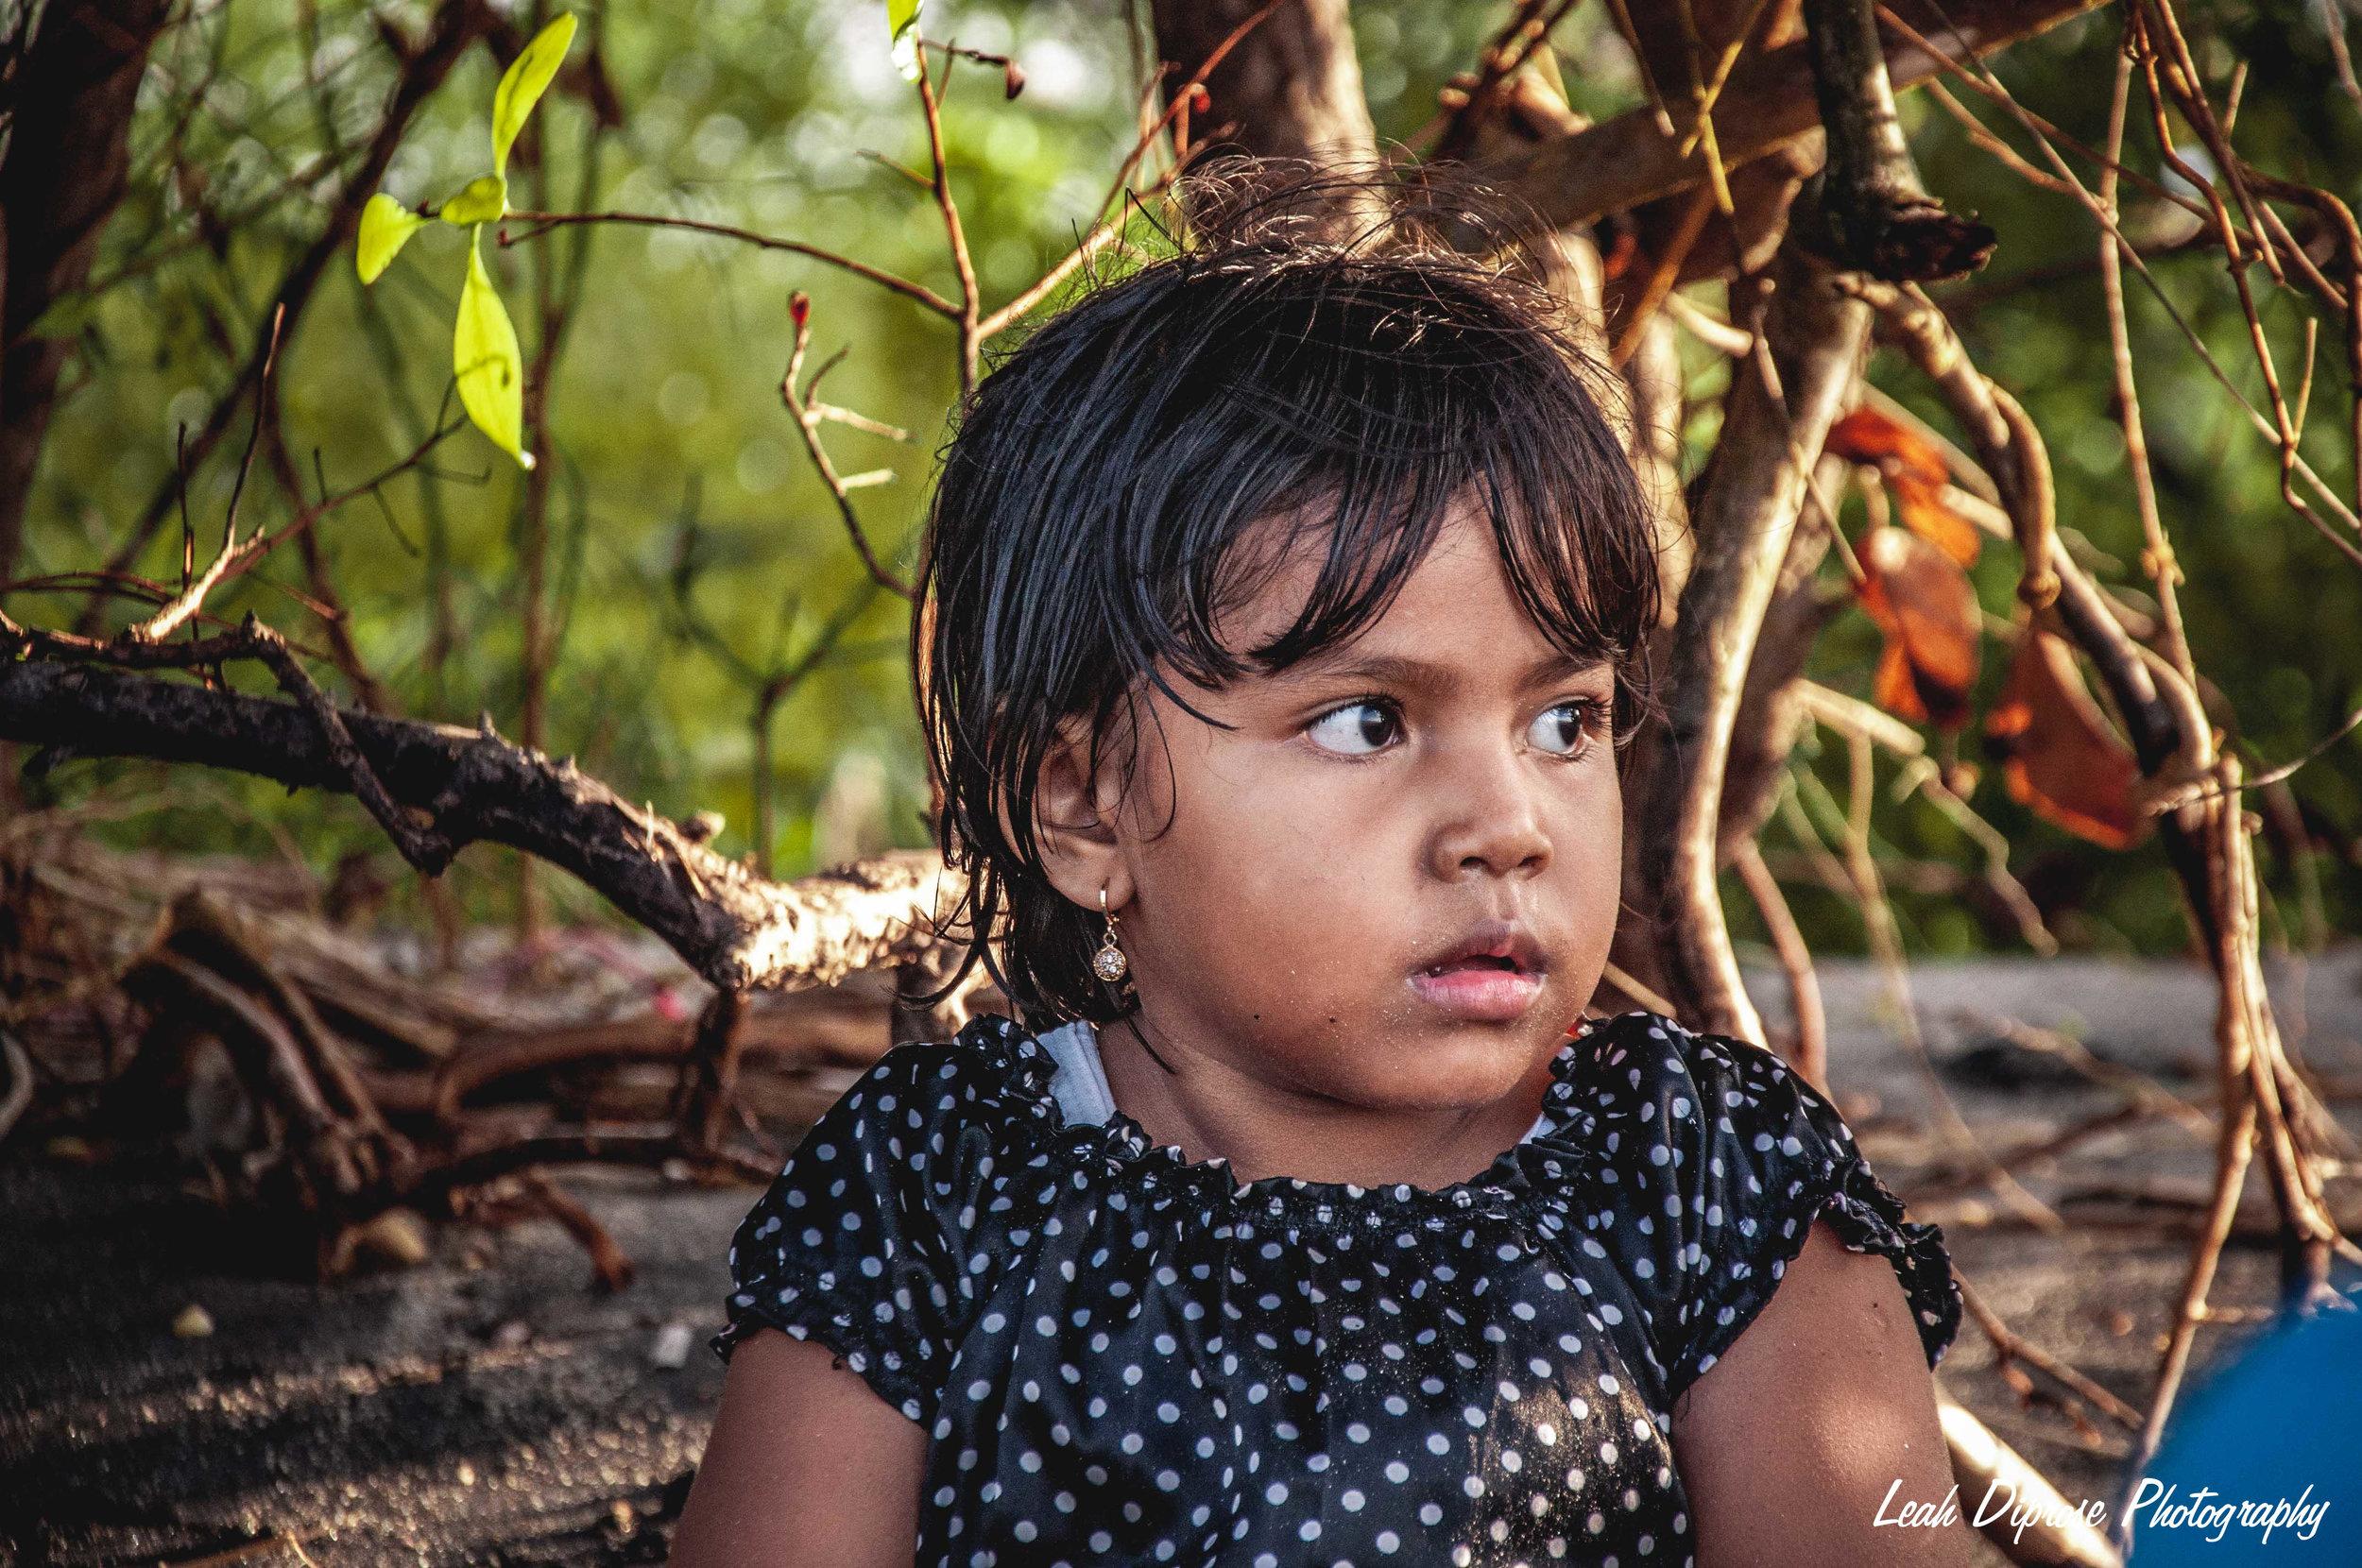 Leah Diprose Photography image-4592.jpg